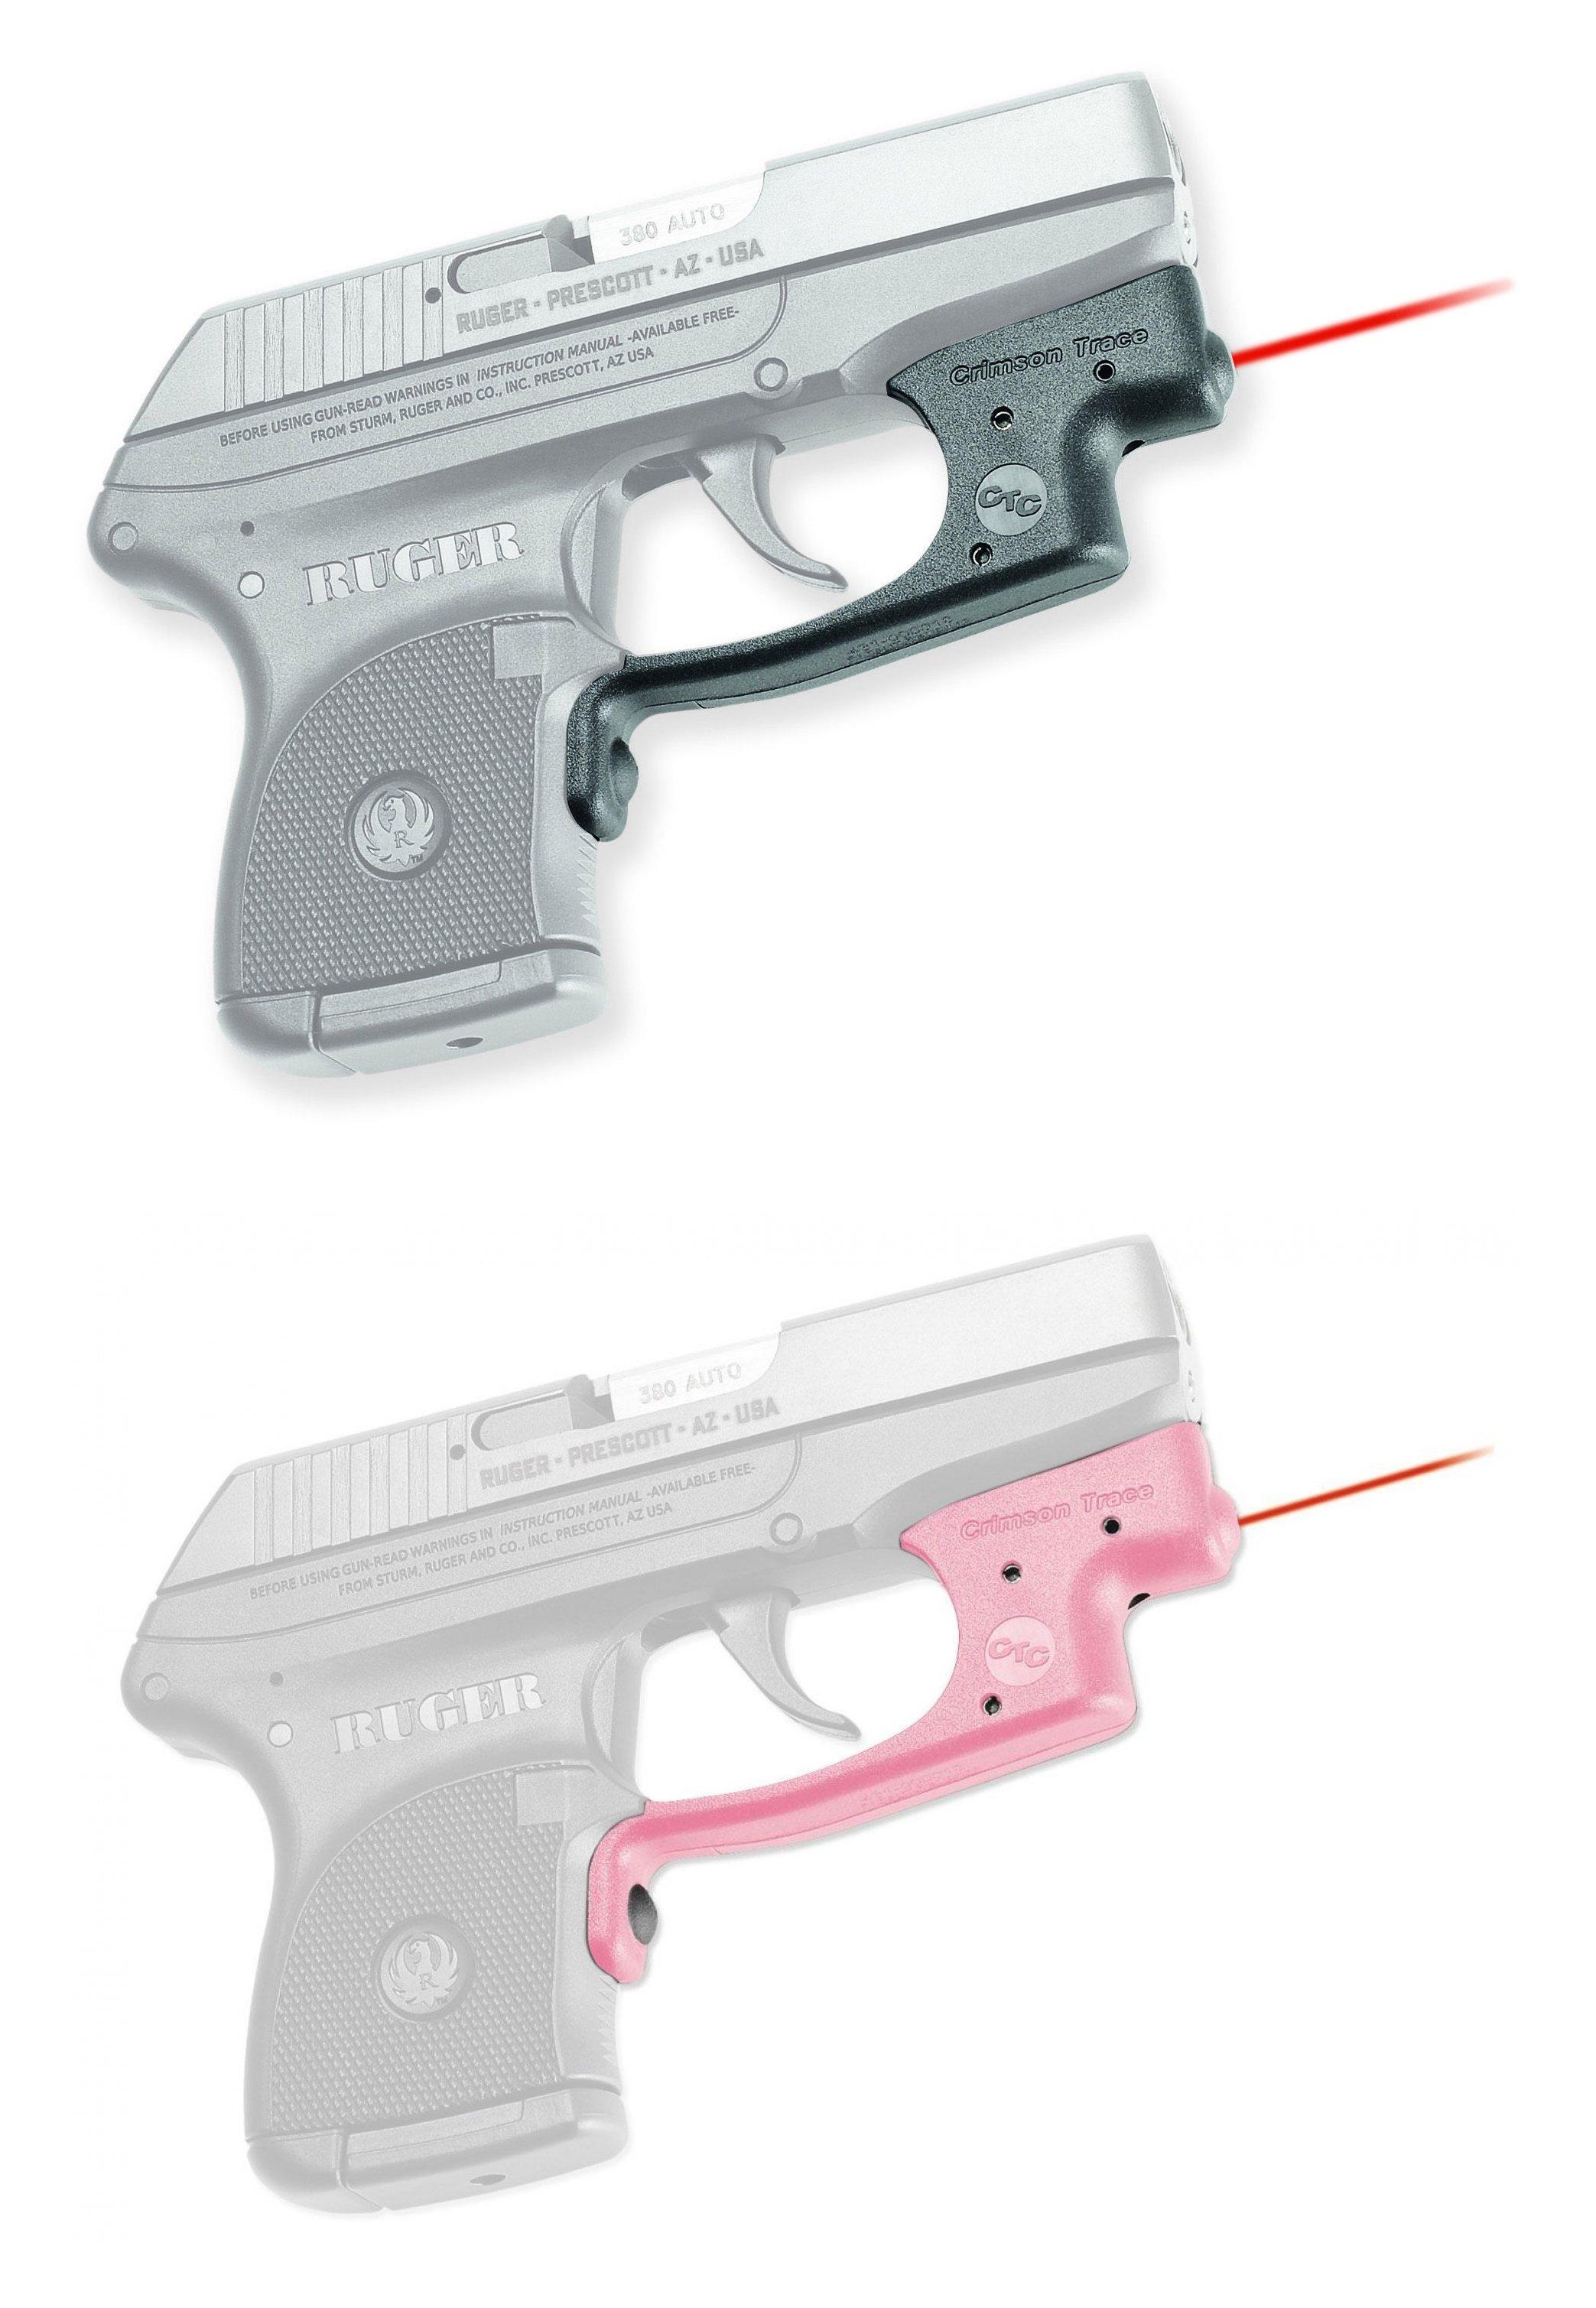 Crimson Trace Laserguard Red Laser Sight for Ruger LCP Handgun